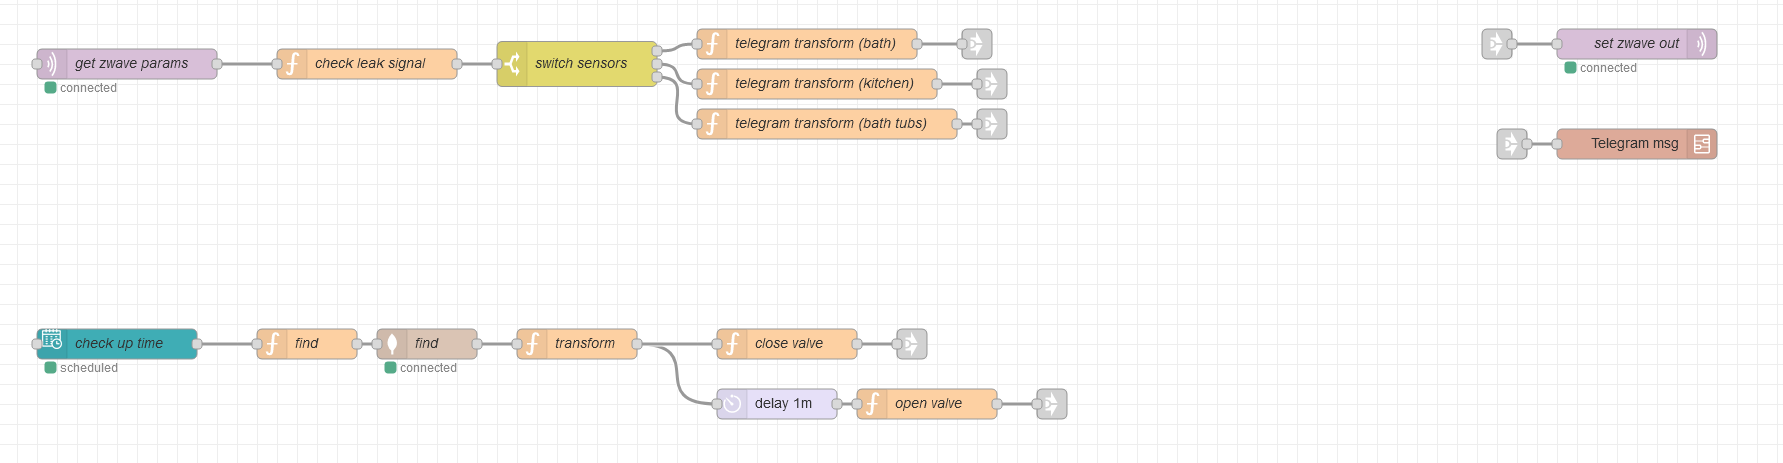 Схема автоматизации приводов